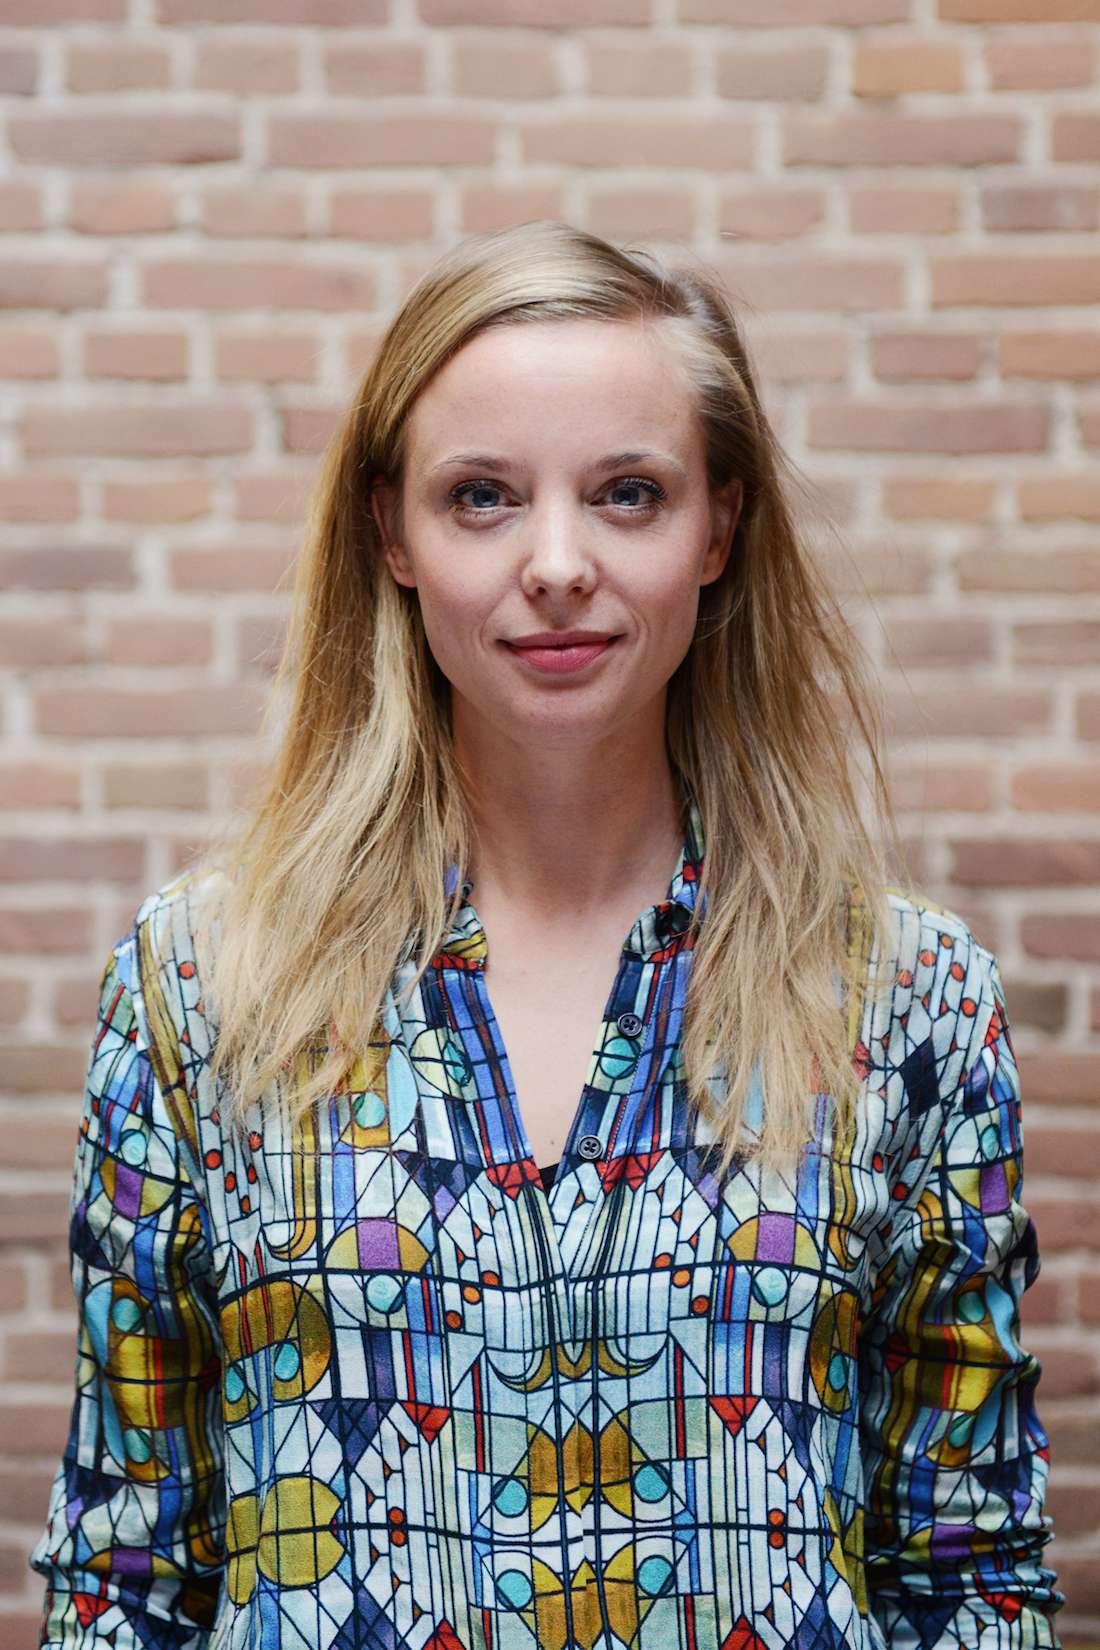 Marga van Beek